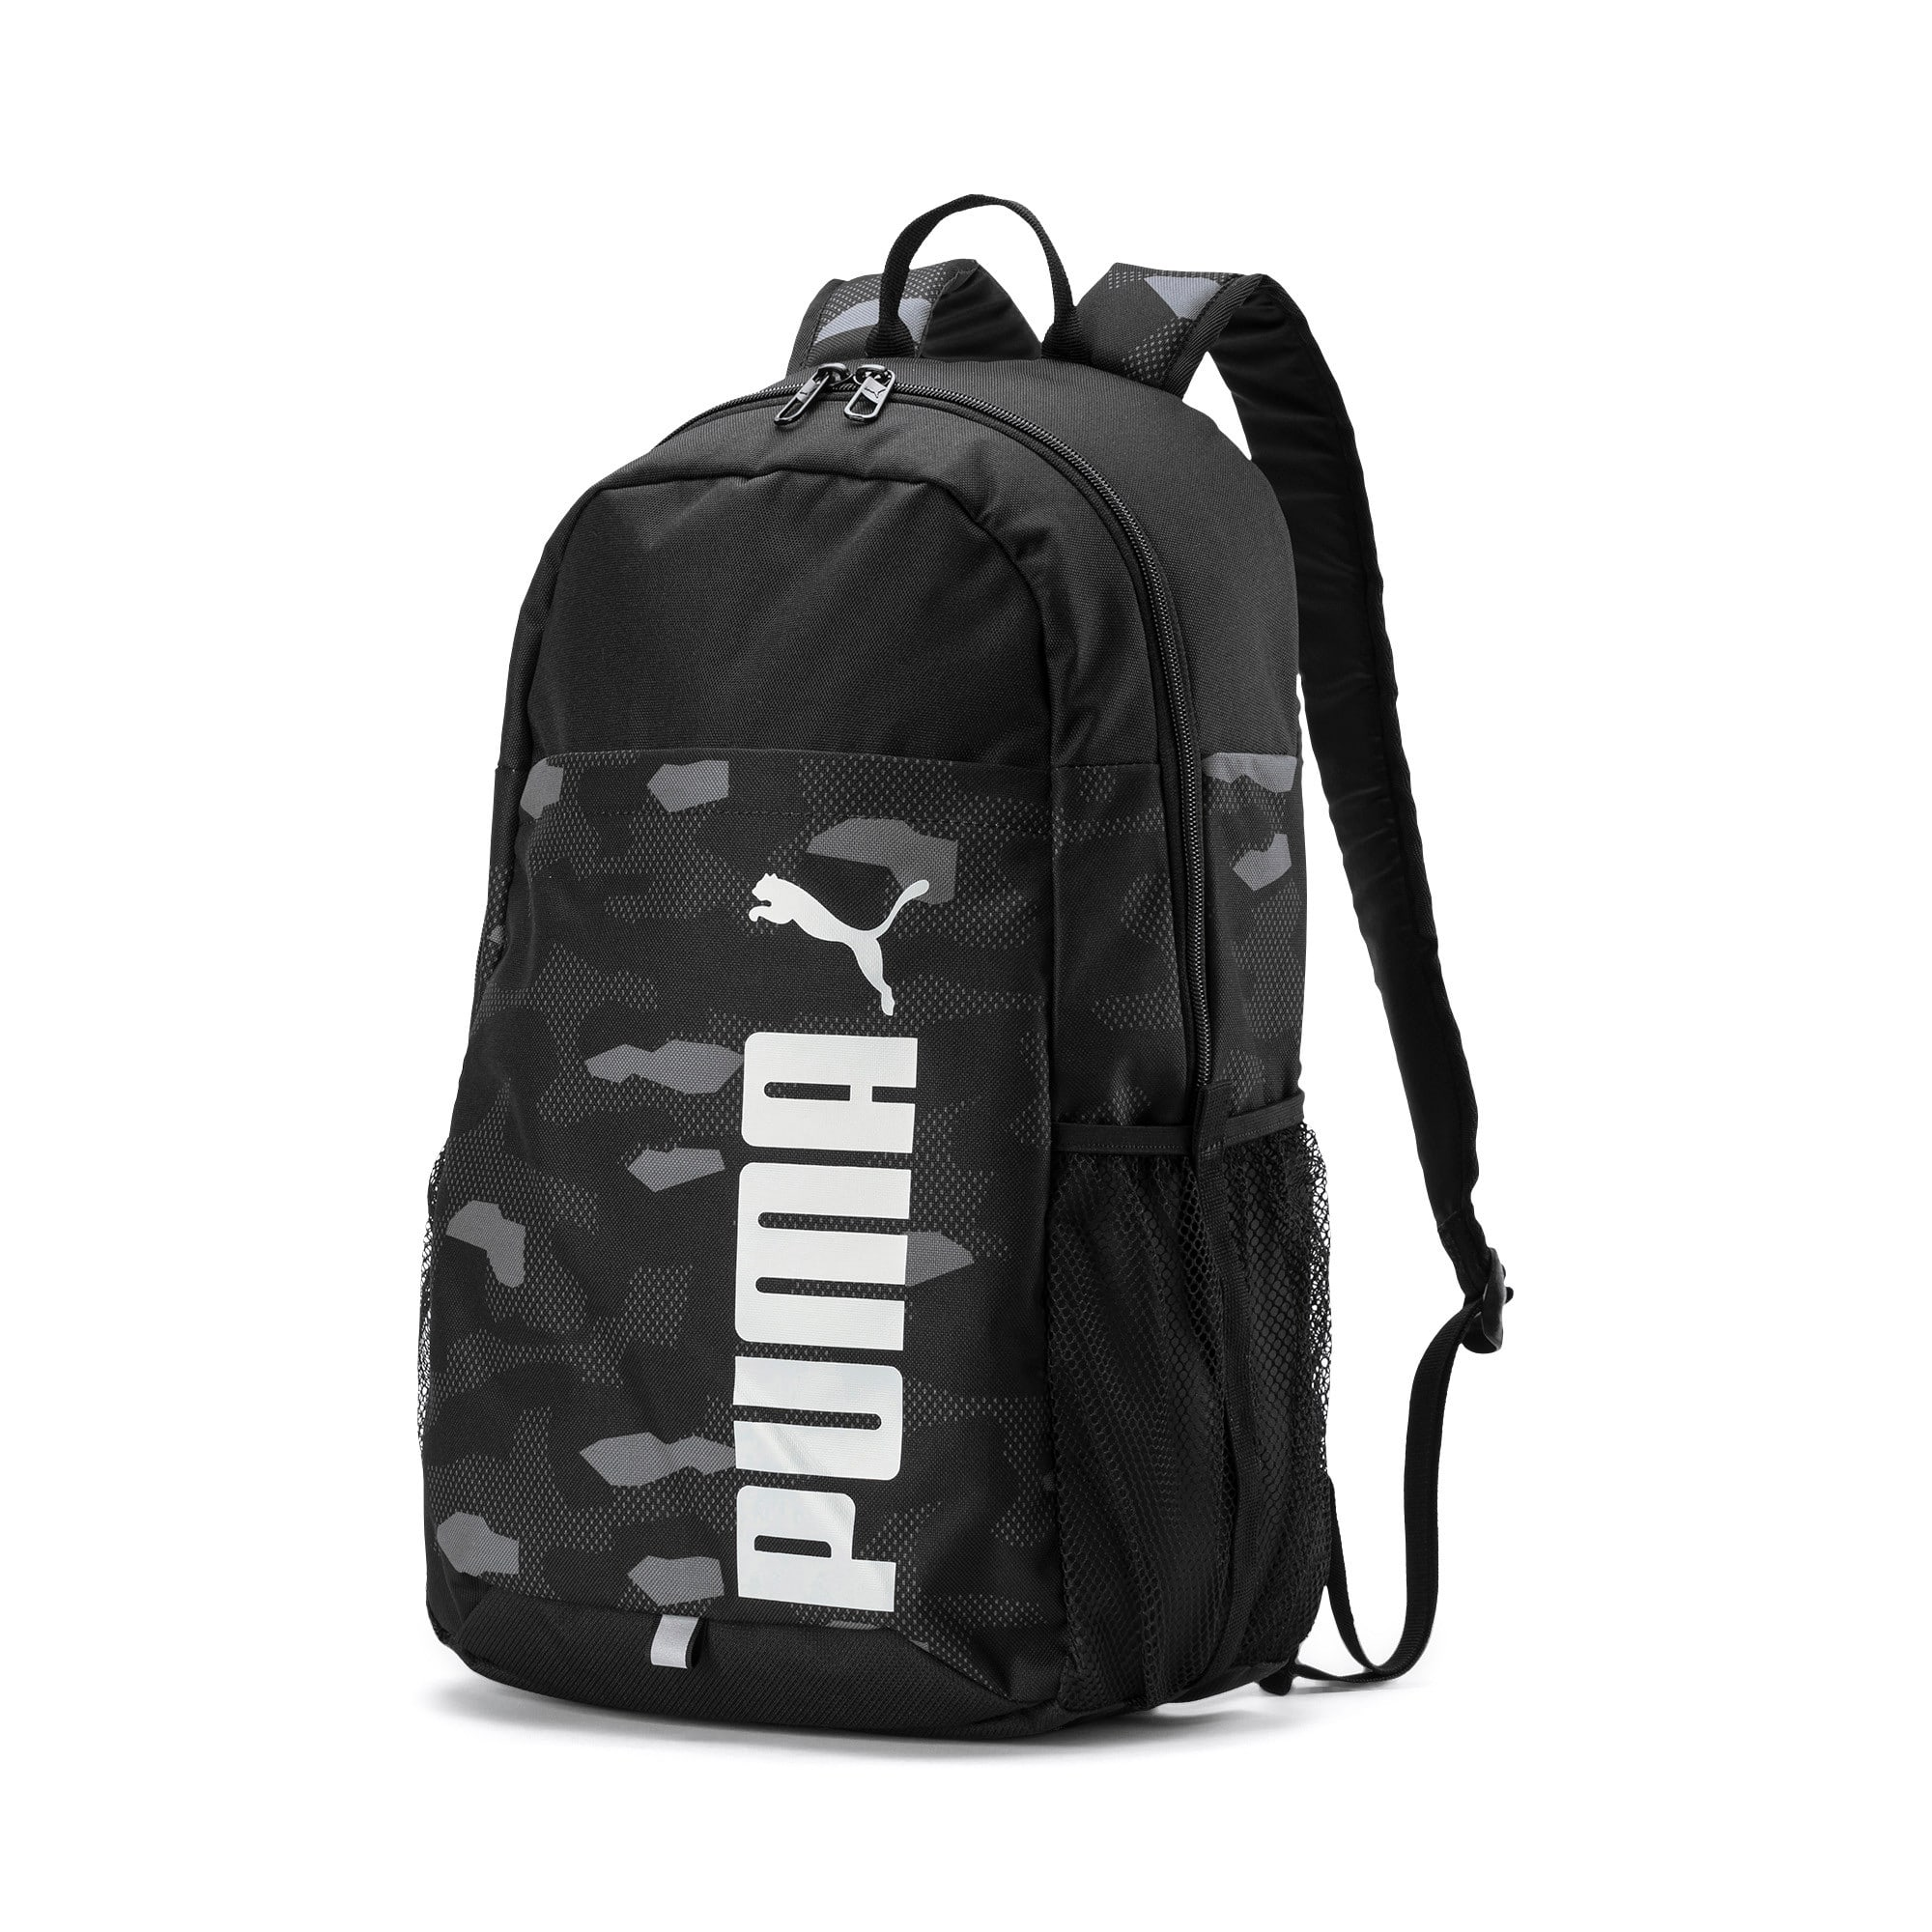 Thumbnail 1 of PUMA Style Backpack, Puma Black-Camo AOP, medium